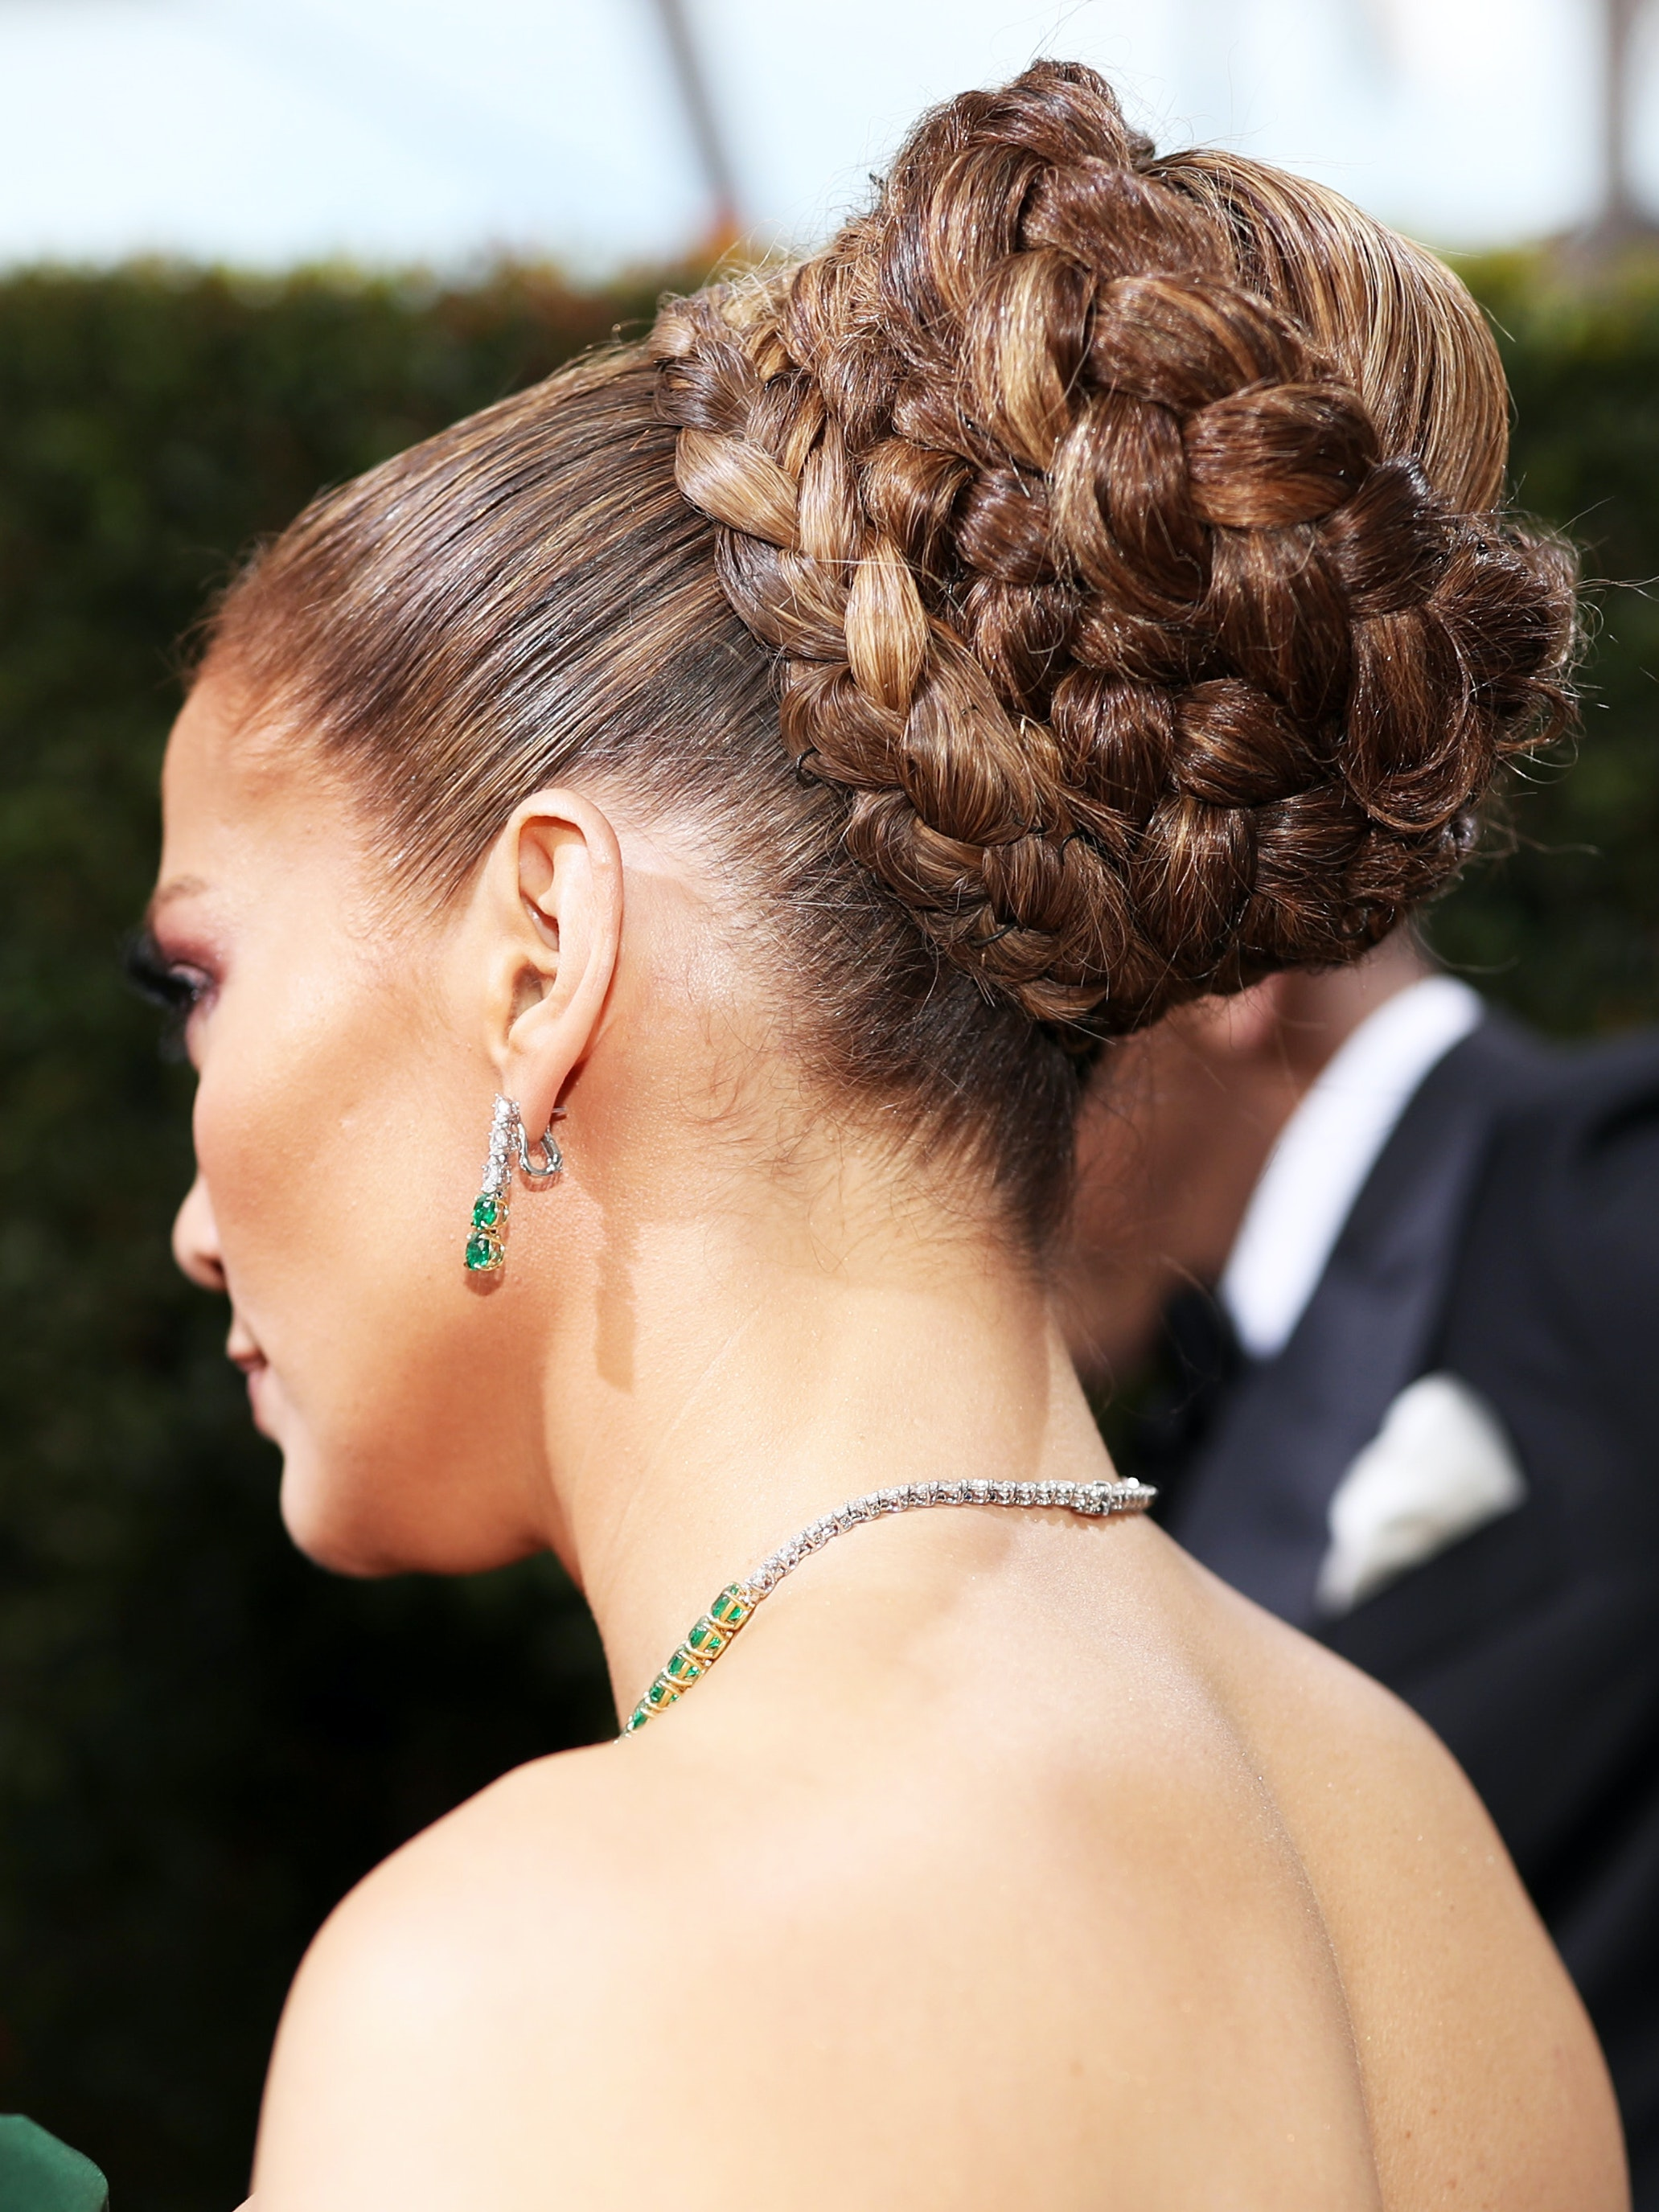 Jennifer lopez hair bun braid 2020 golden globes